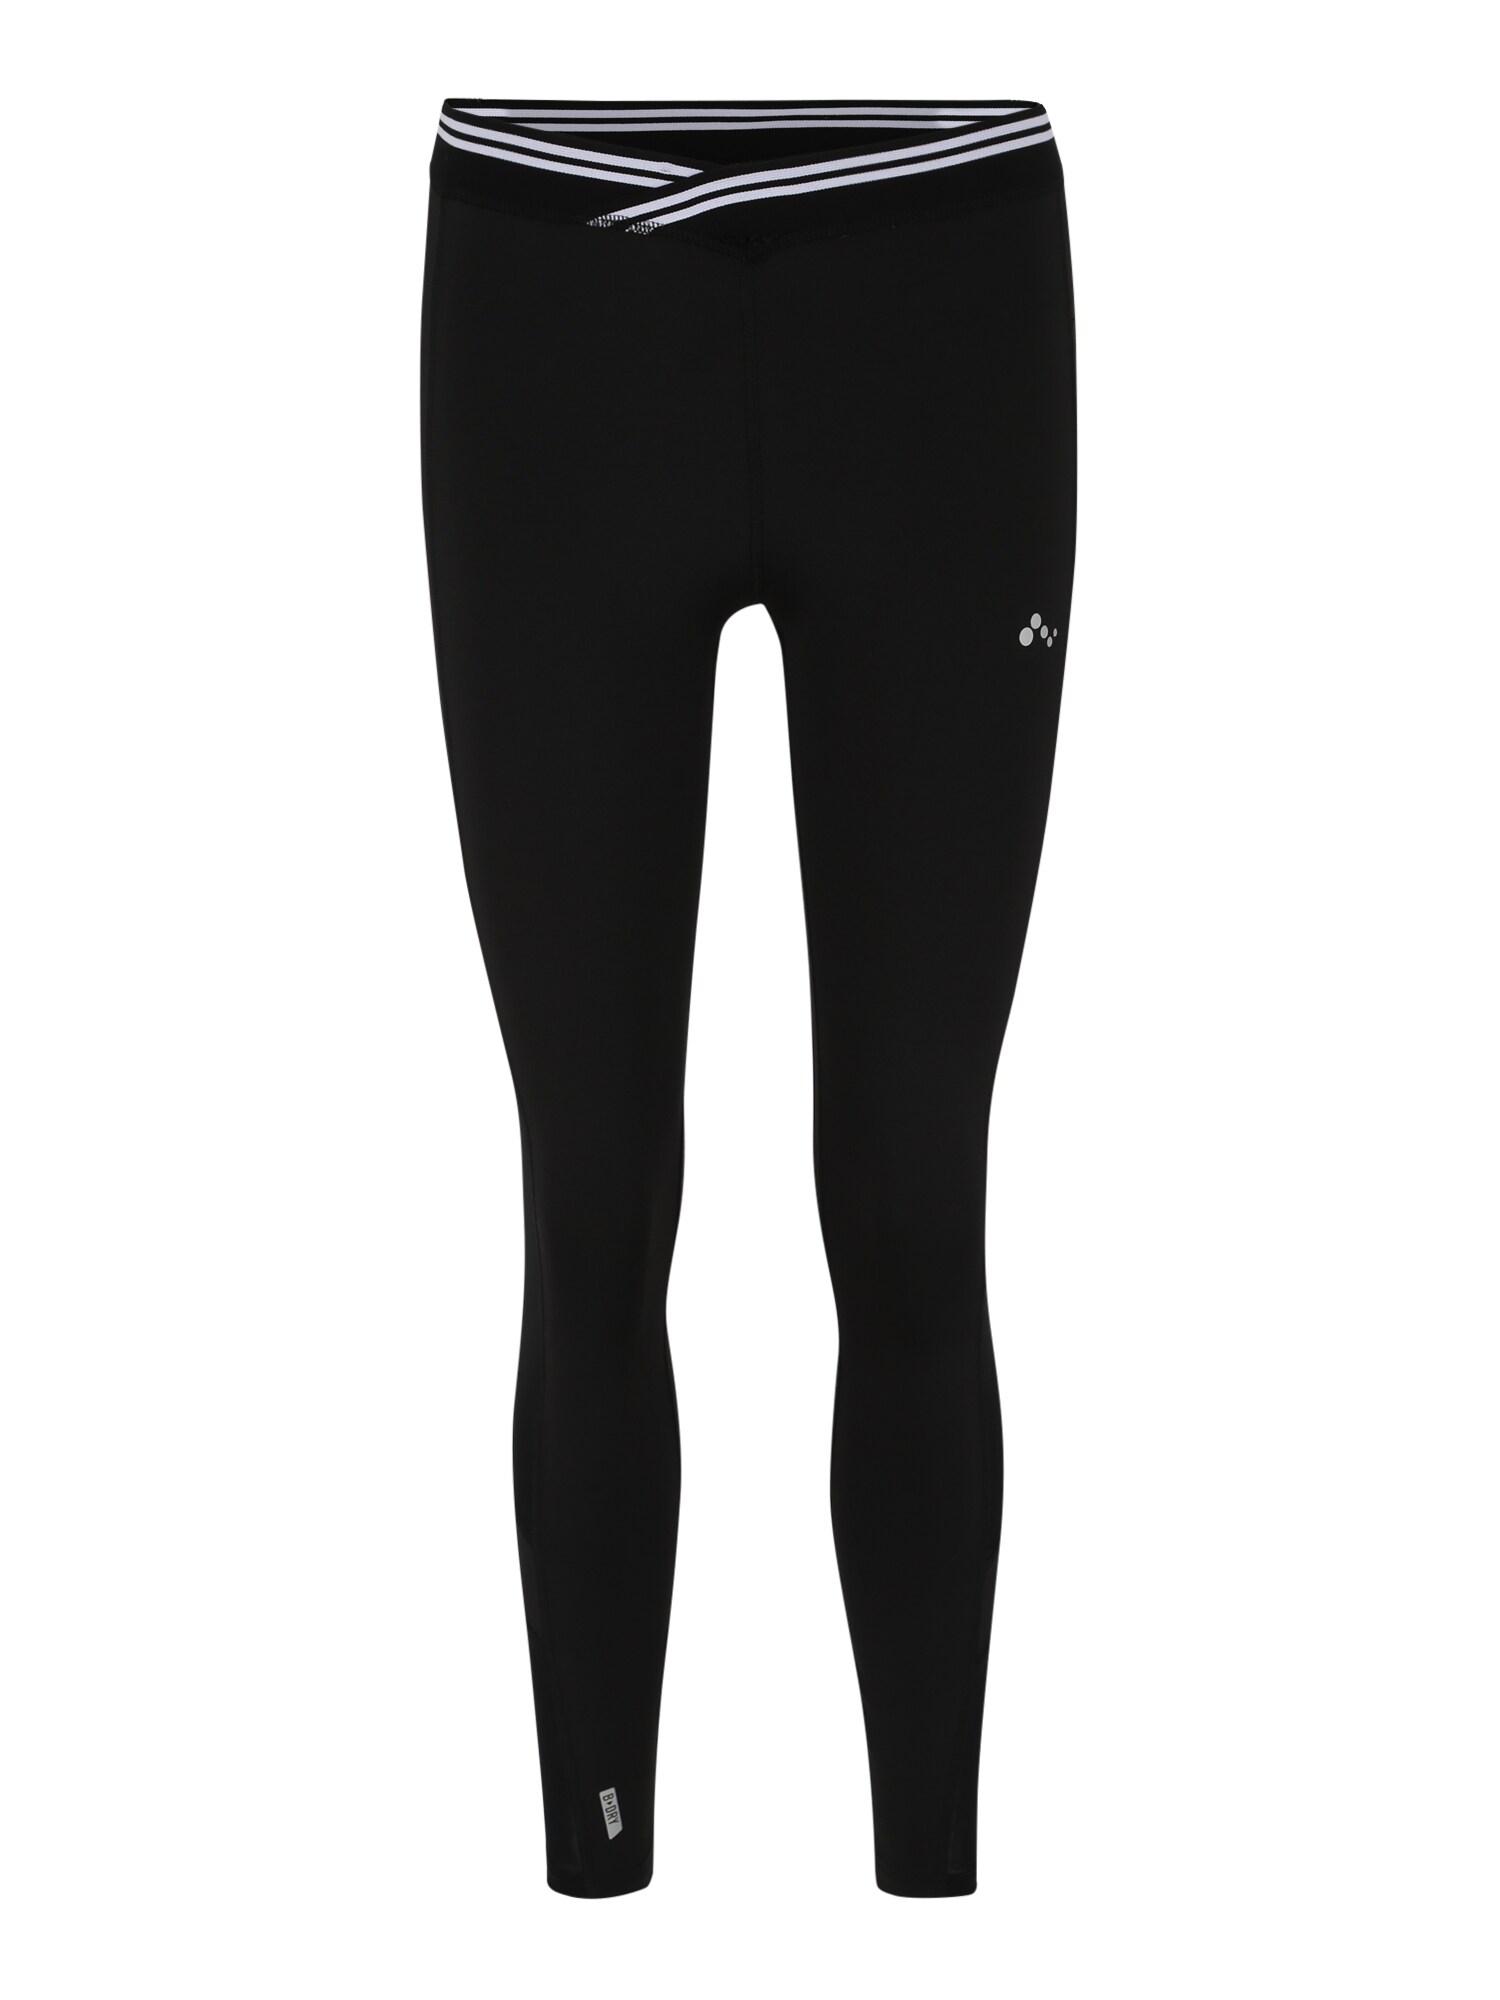 Sport-Leggings 'Mila' | Sportbekleidung > Sporthosen > Sportleggings | Schwarz - Weiß | ONLY PLAY